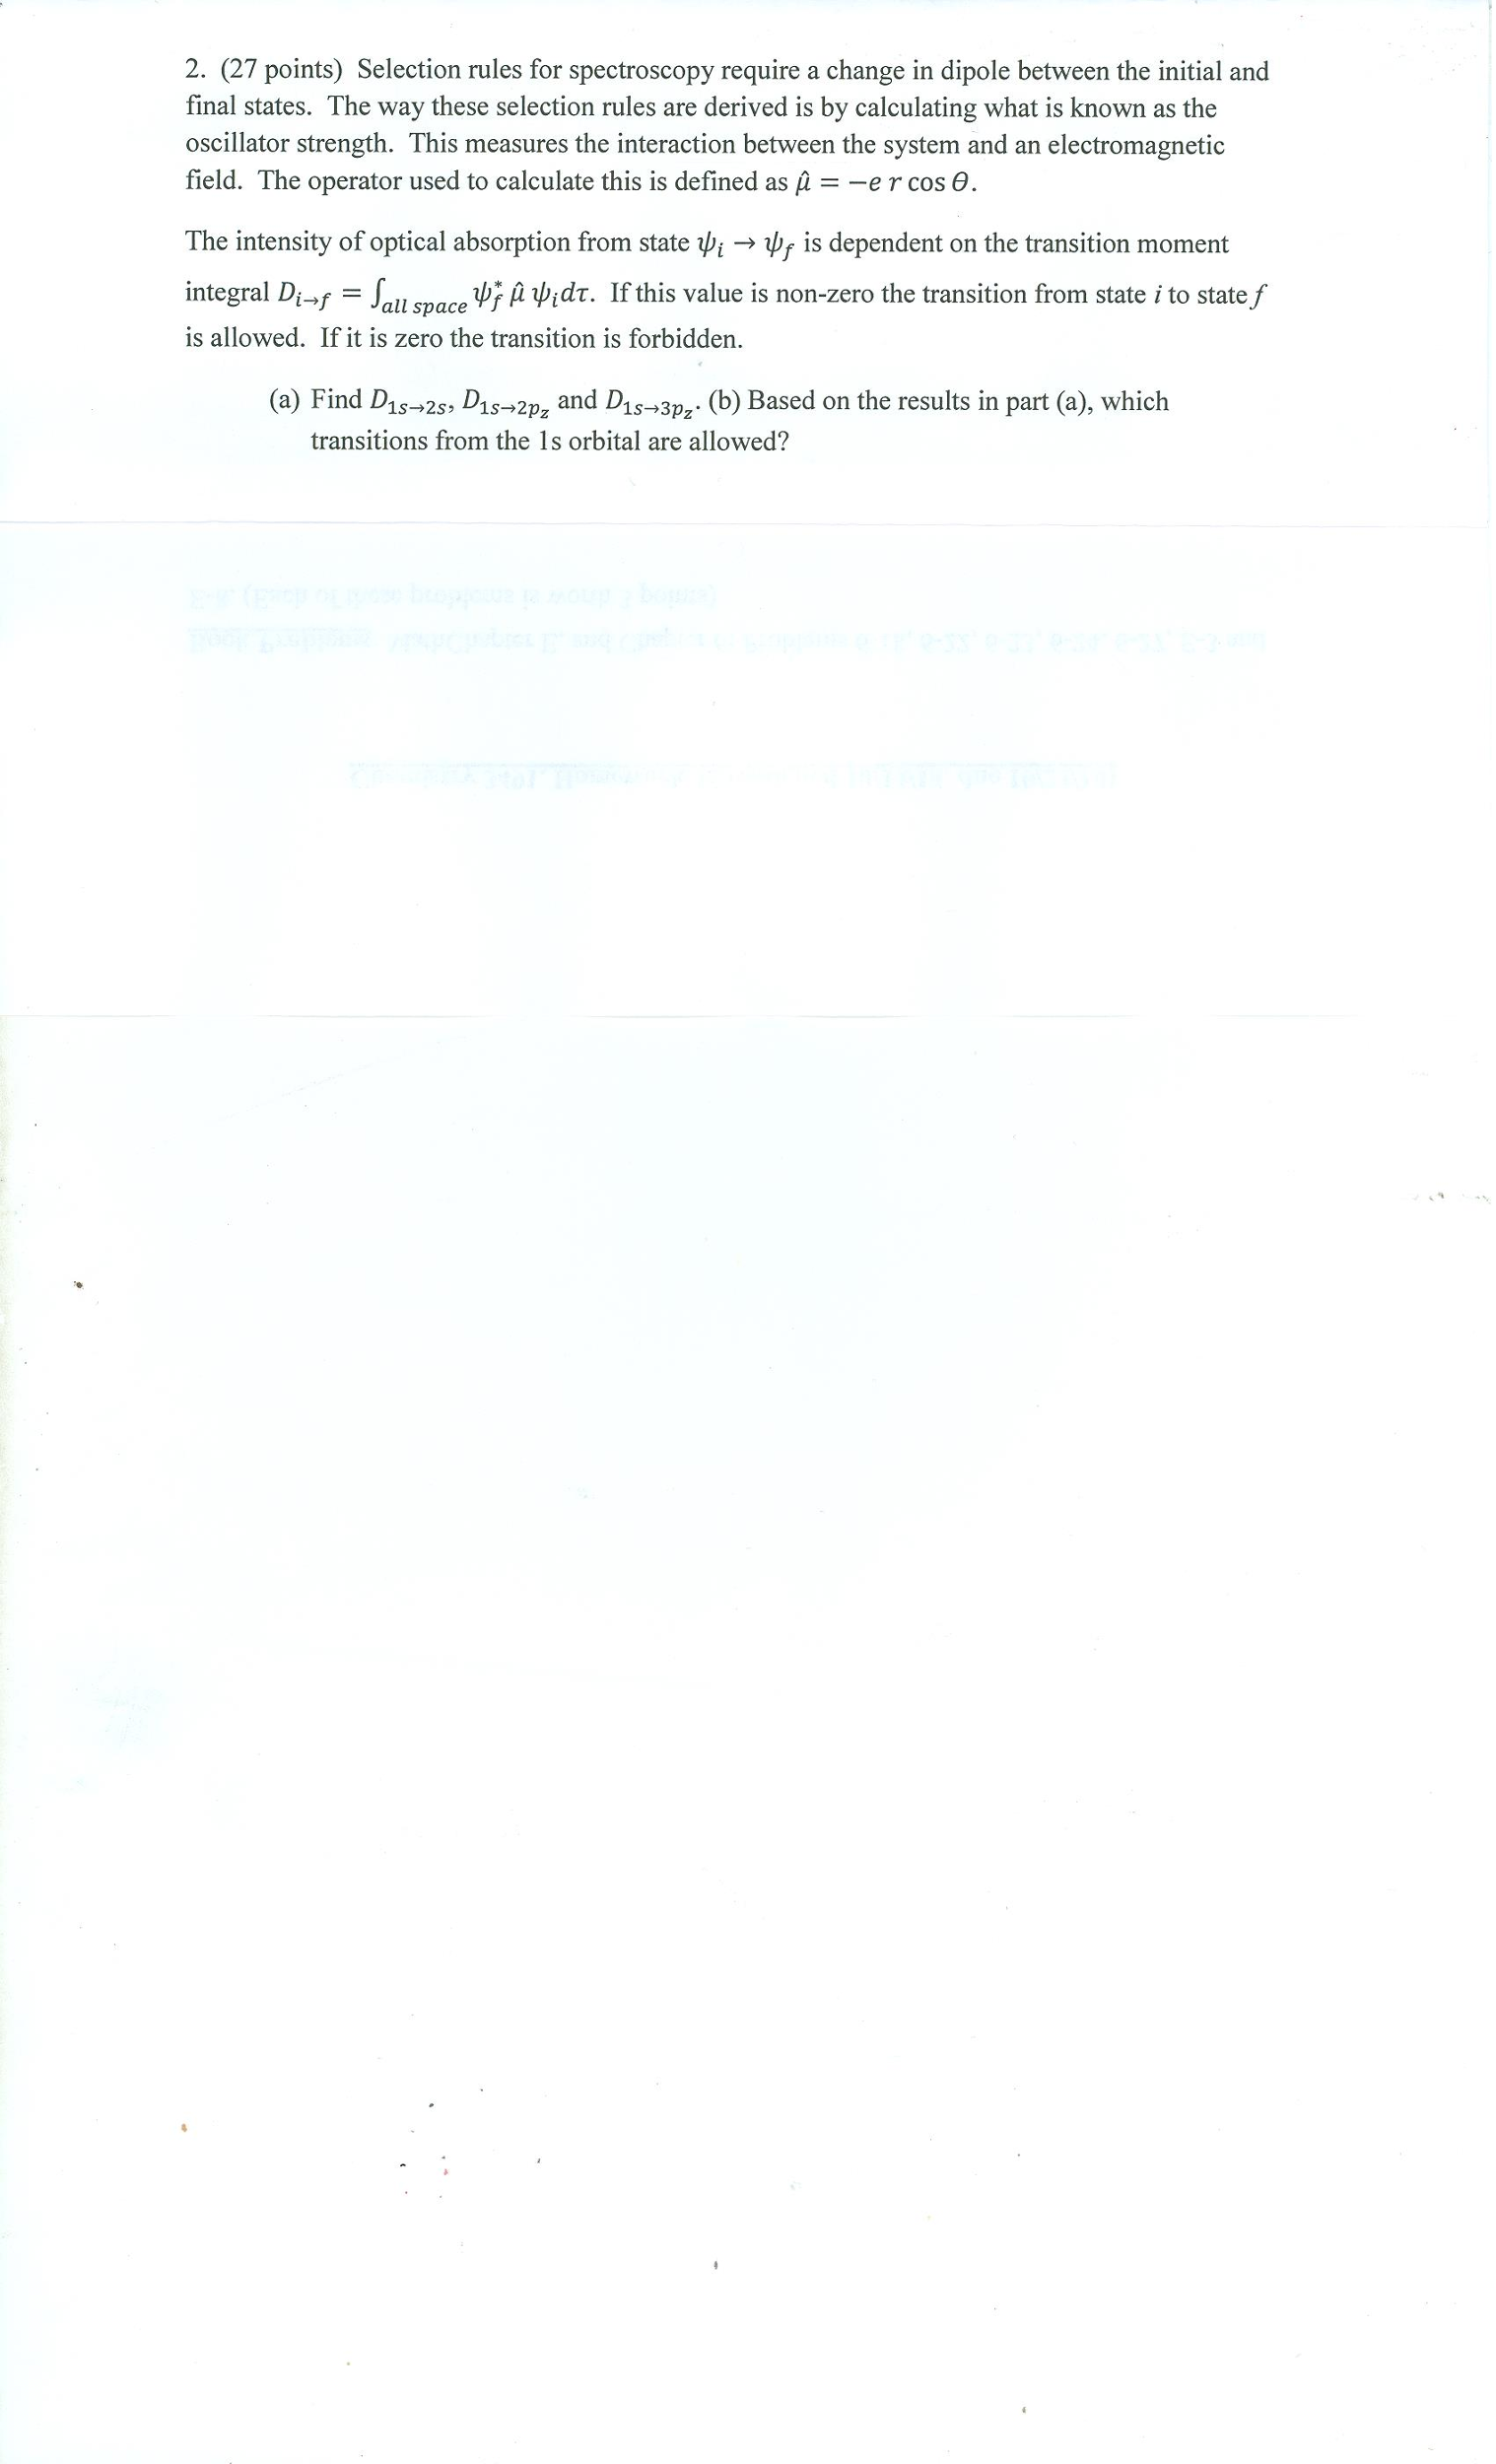 Chemistry Archive | October 20, 2014 | Chegg.com